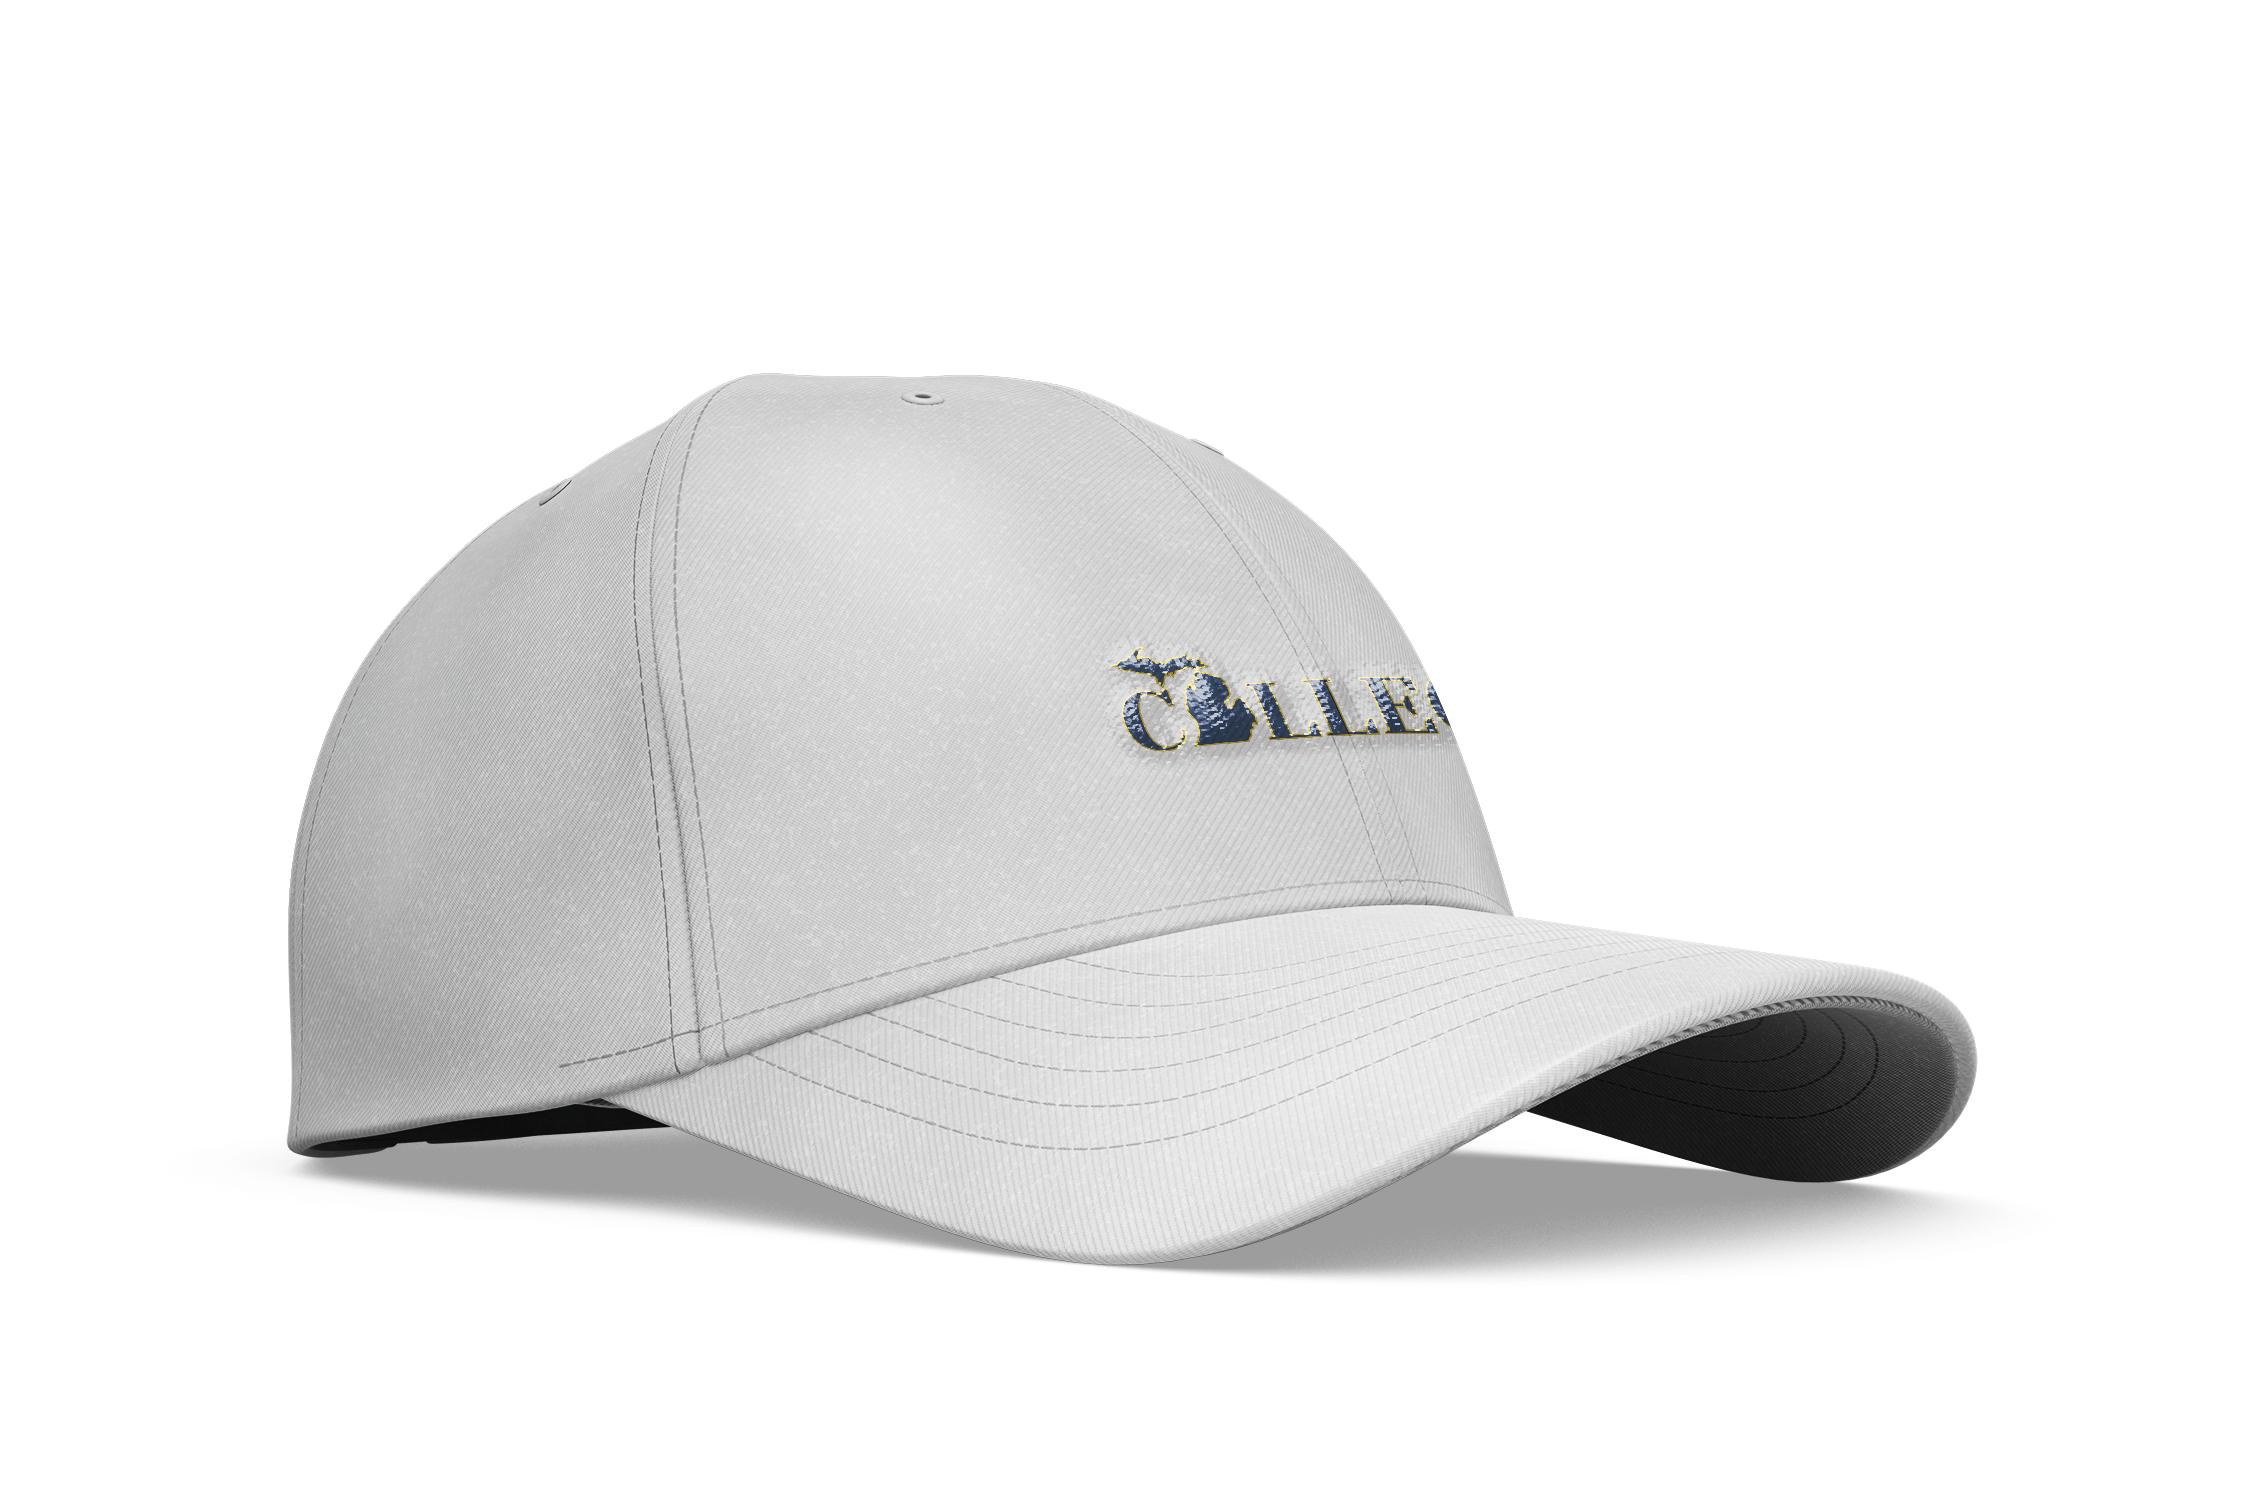 Hat Designs - Photo Mockups - Design 2b New.png